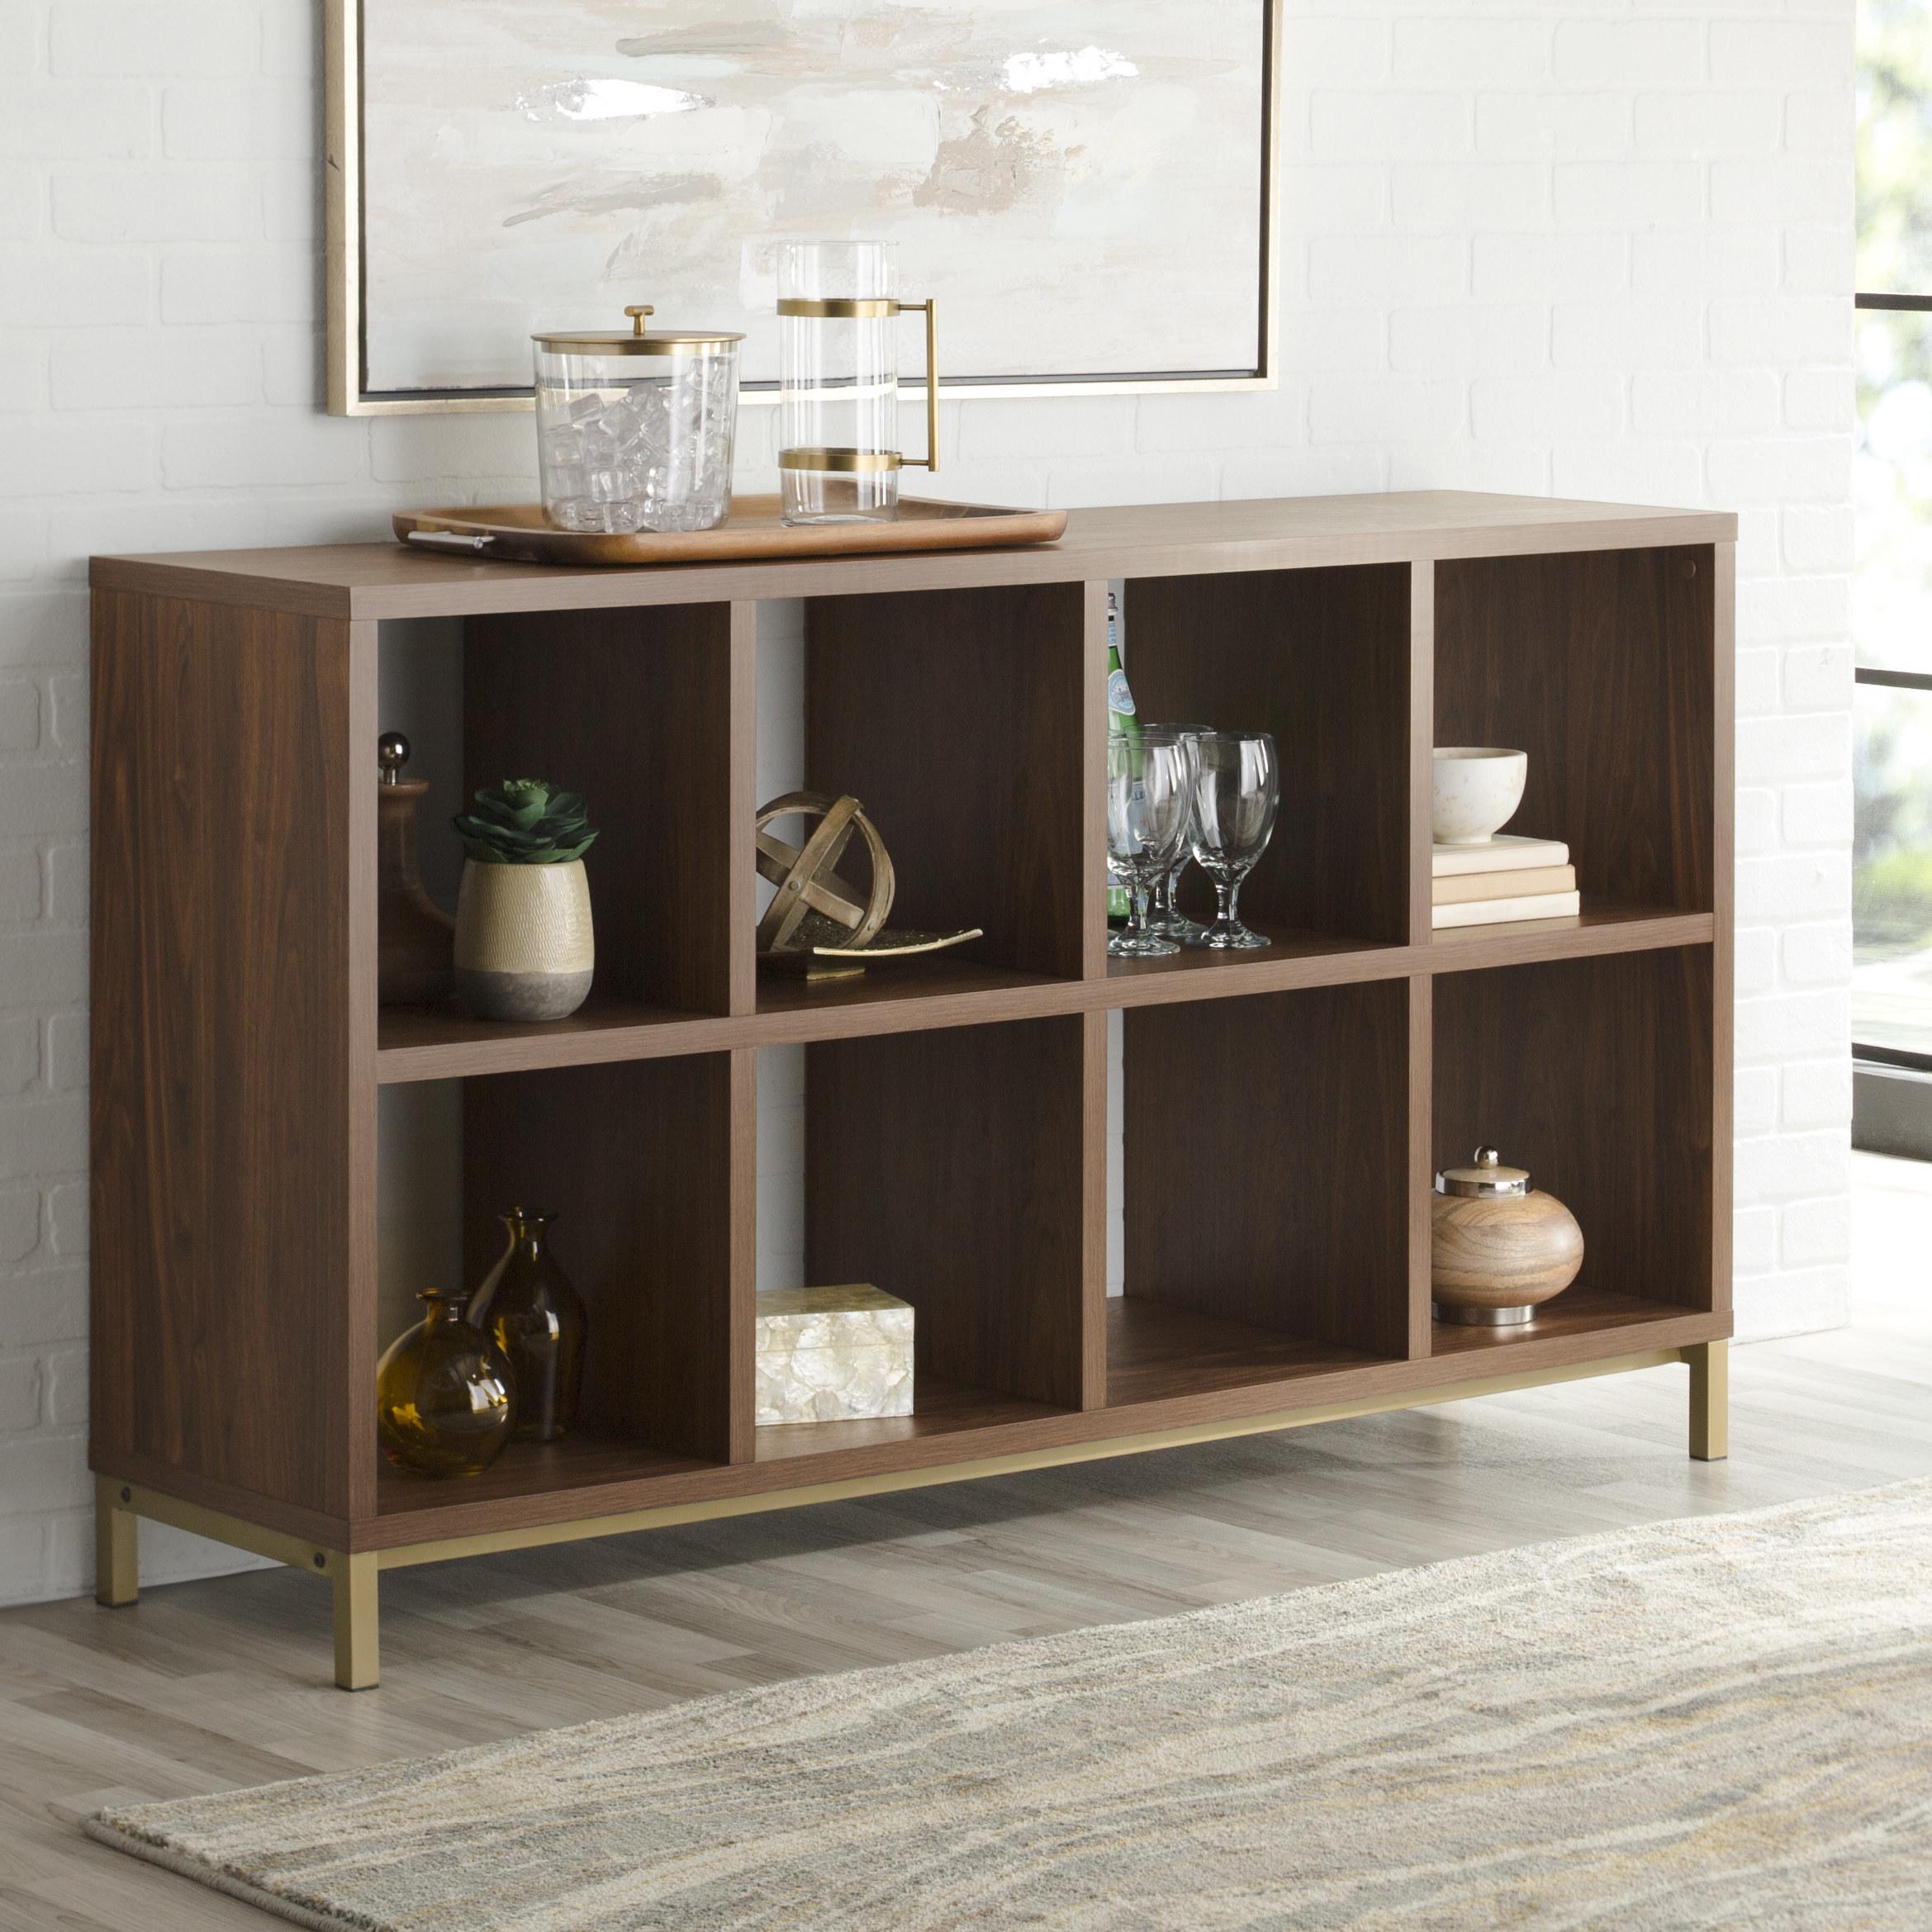 dark wood cube storage organizer with decorative items in it